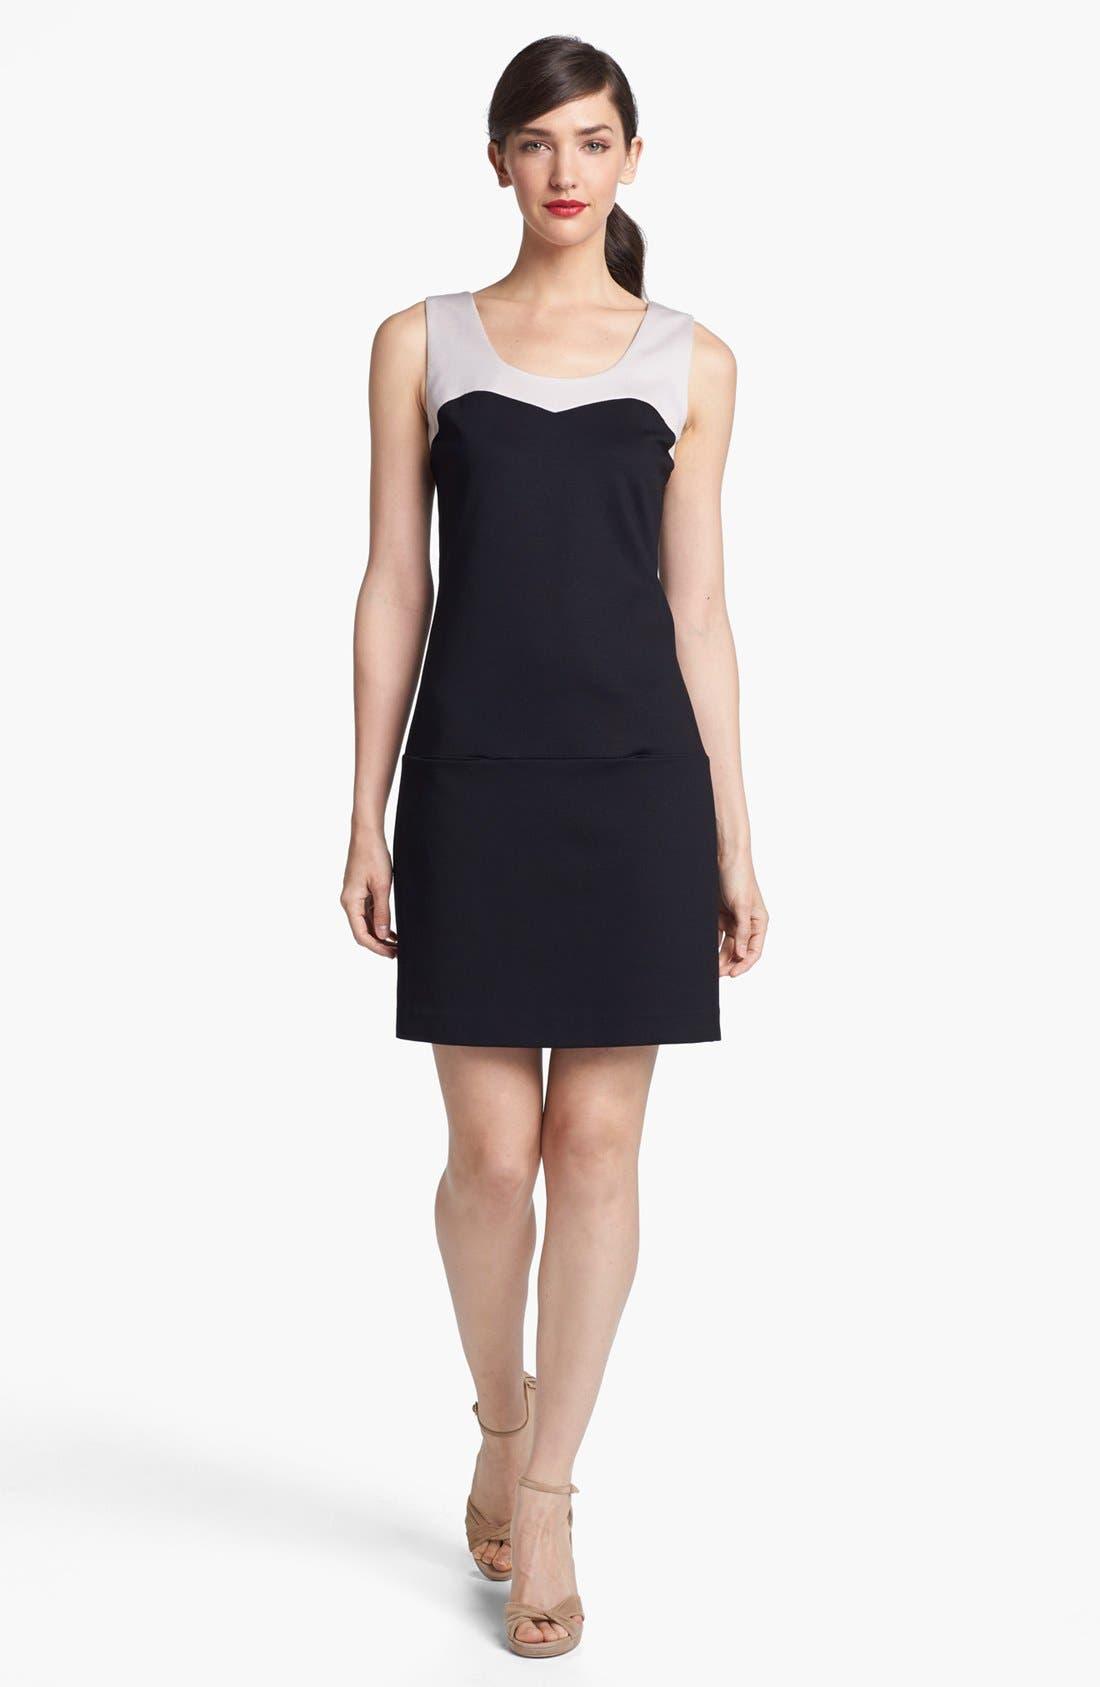 Alternate Image 1 Selected - Trina Turk 'Stacie' Stretch Tank Dress